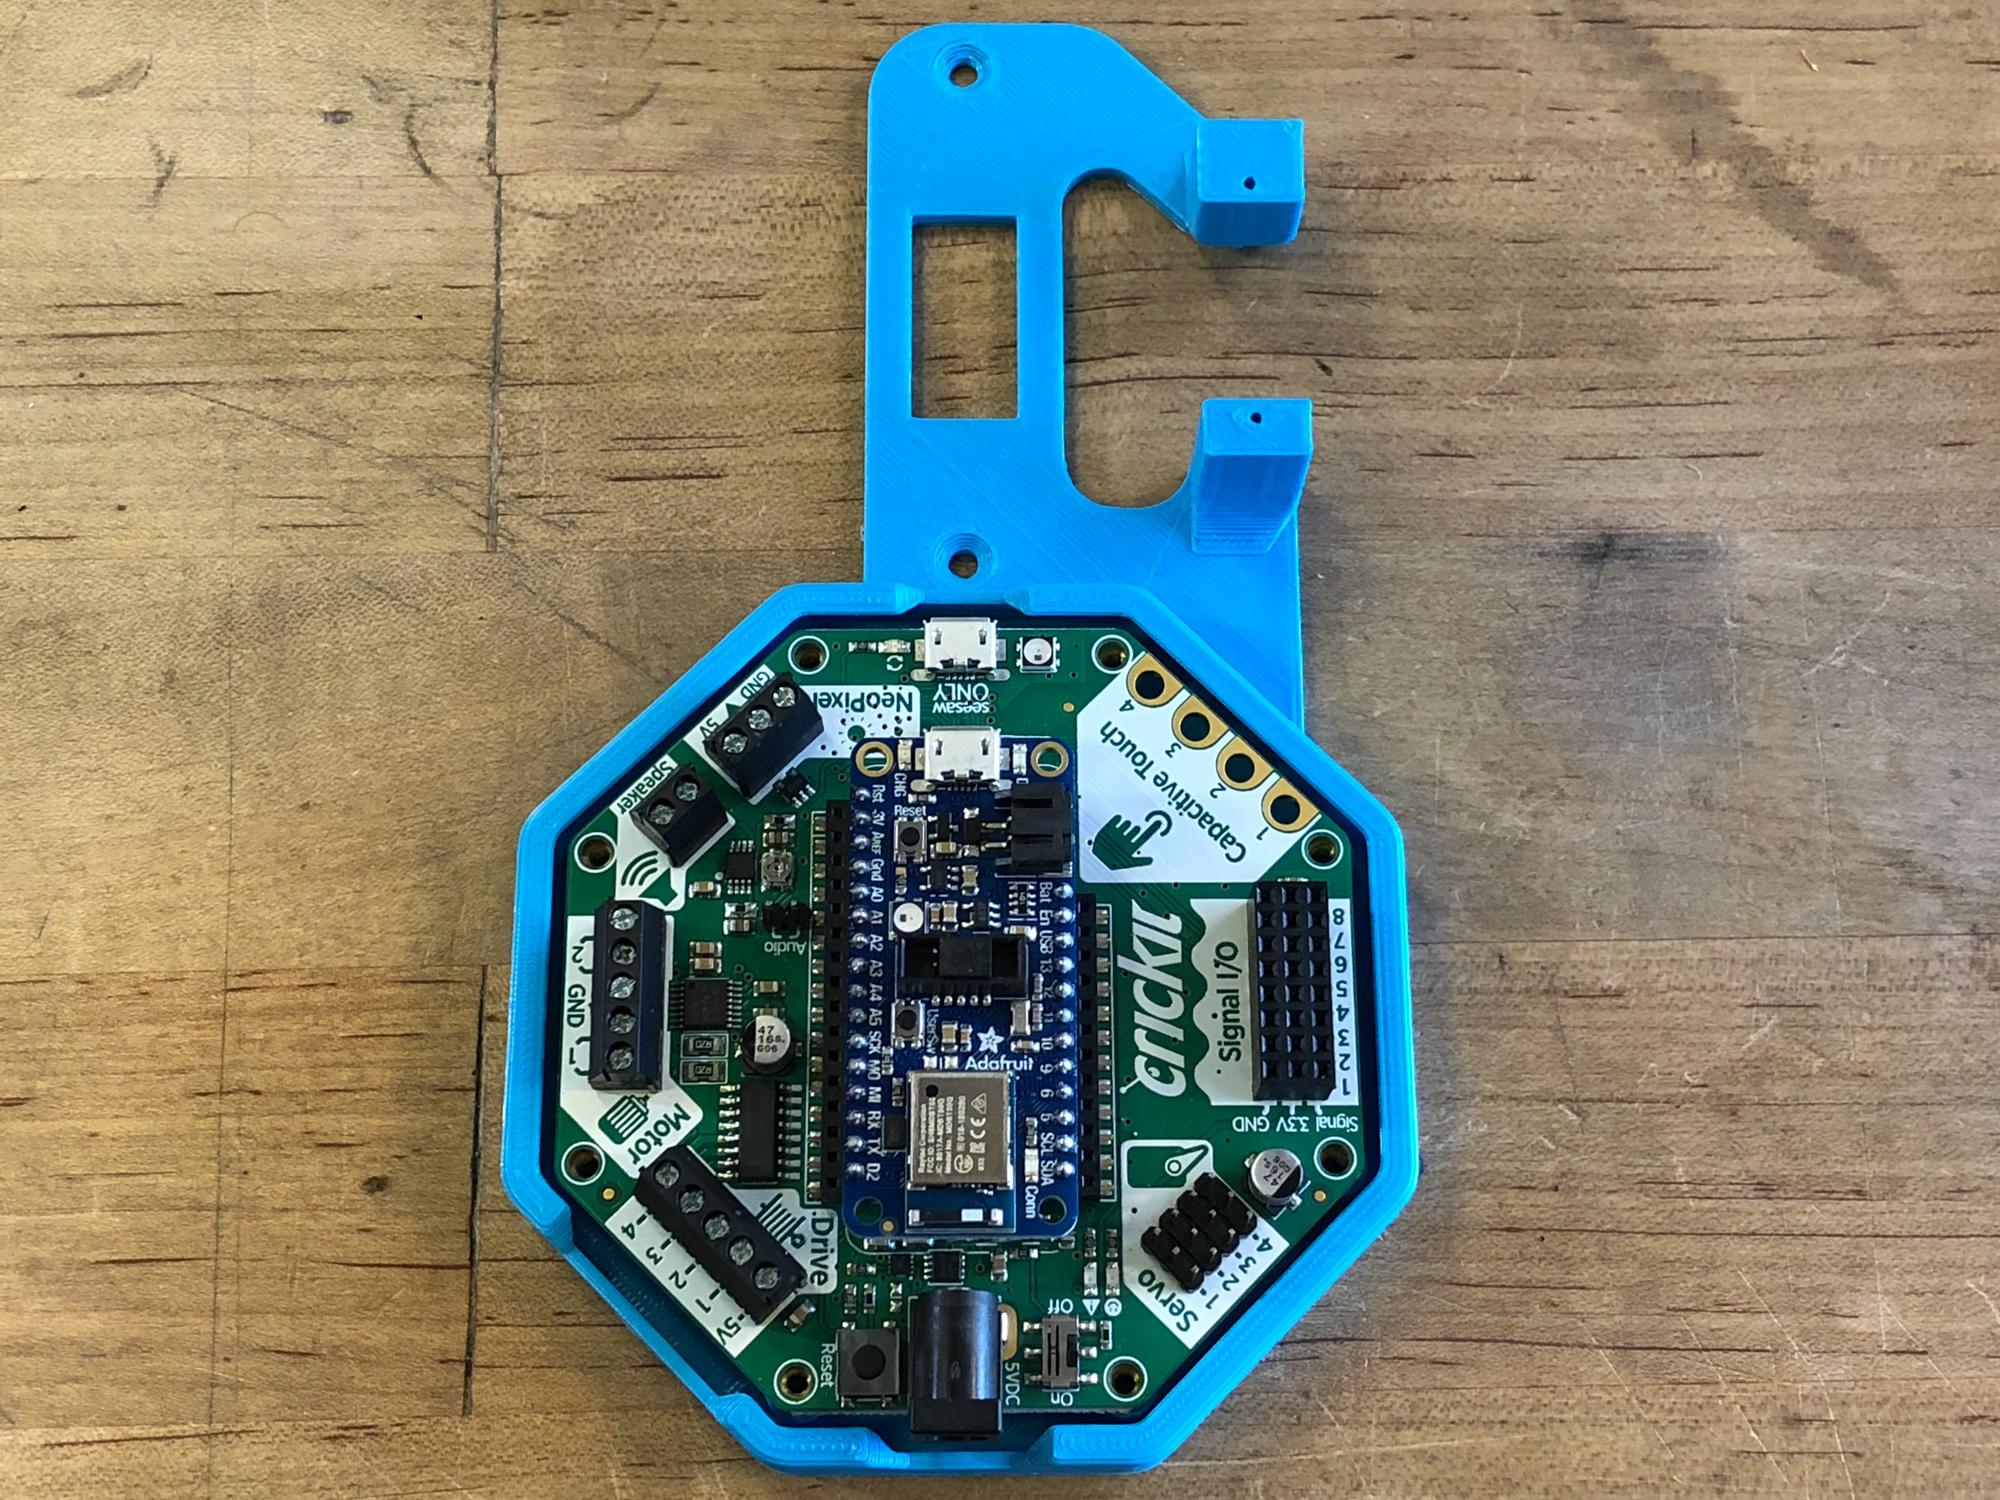 circuitpython_IMG_3952_2k.jpg